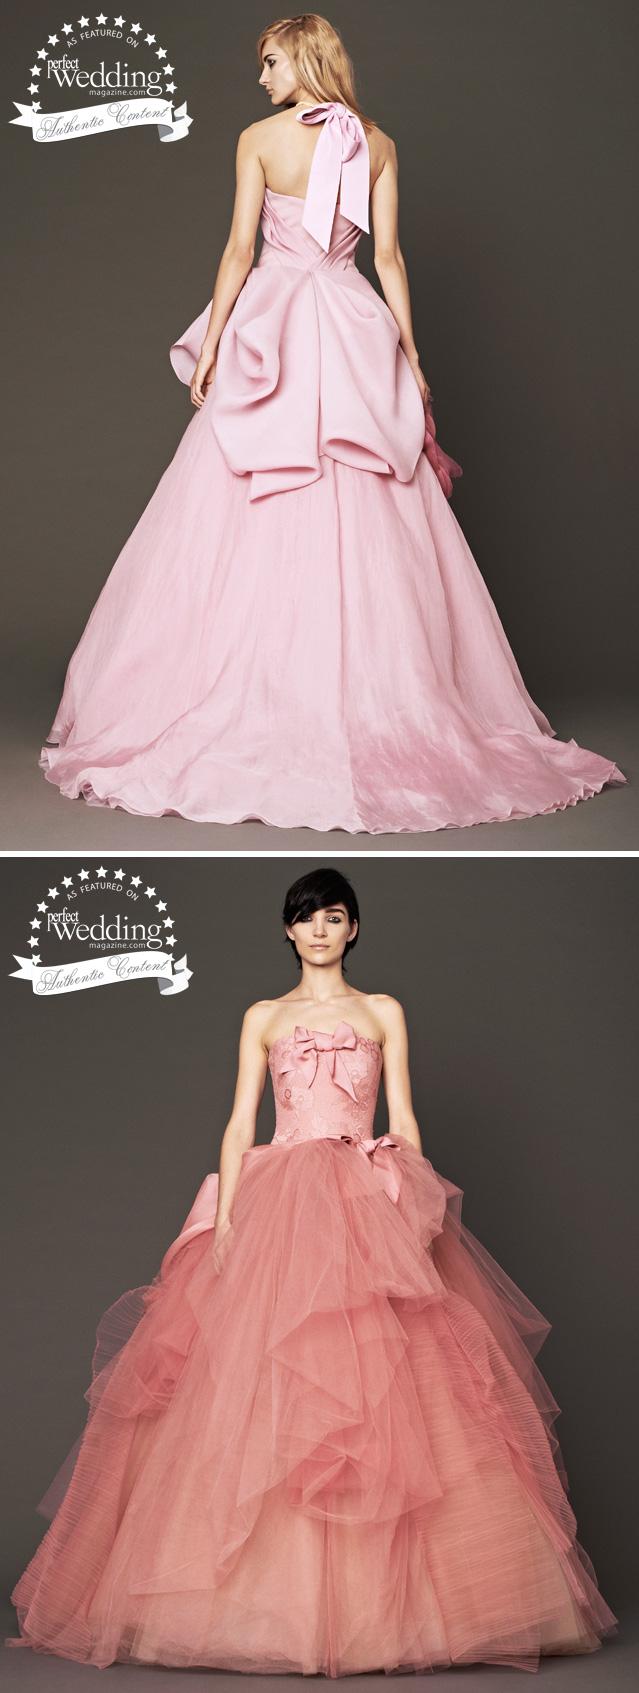 Vera Wang, Fall 2014 Bridal, New York Bridal Week, Perfect Wedding magazine, Fashion, Pink gowns